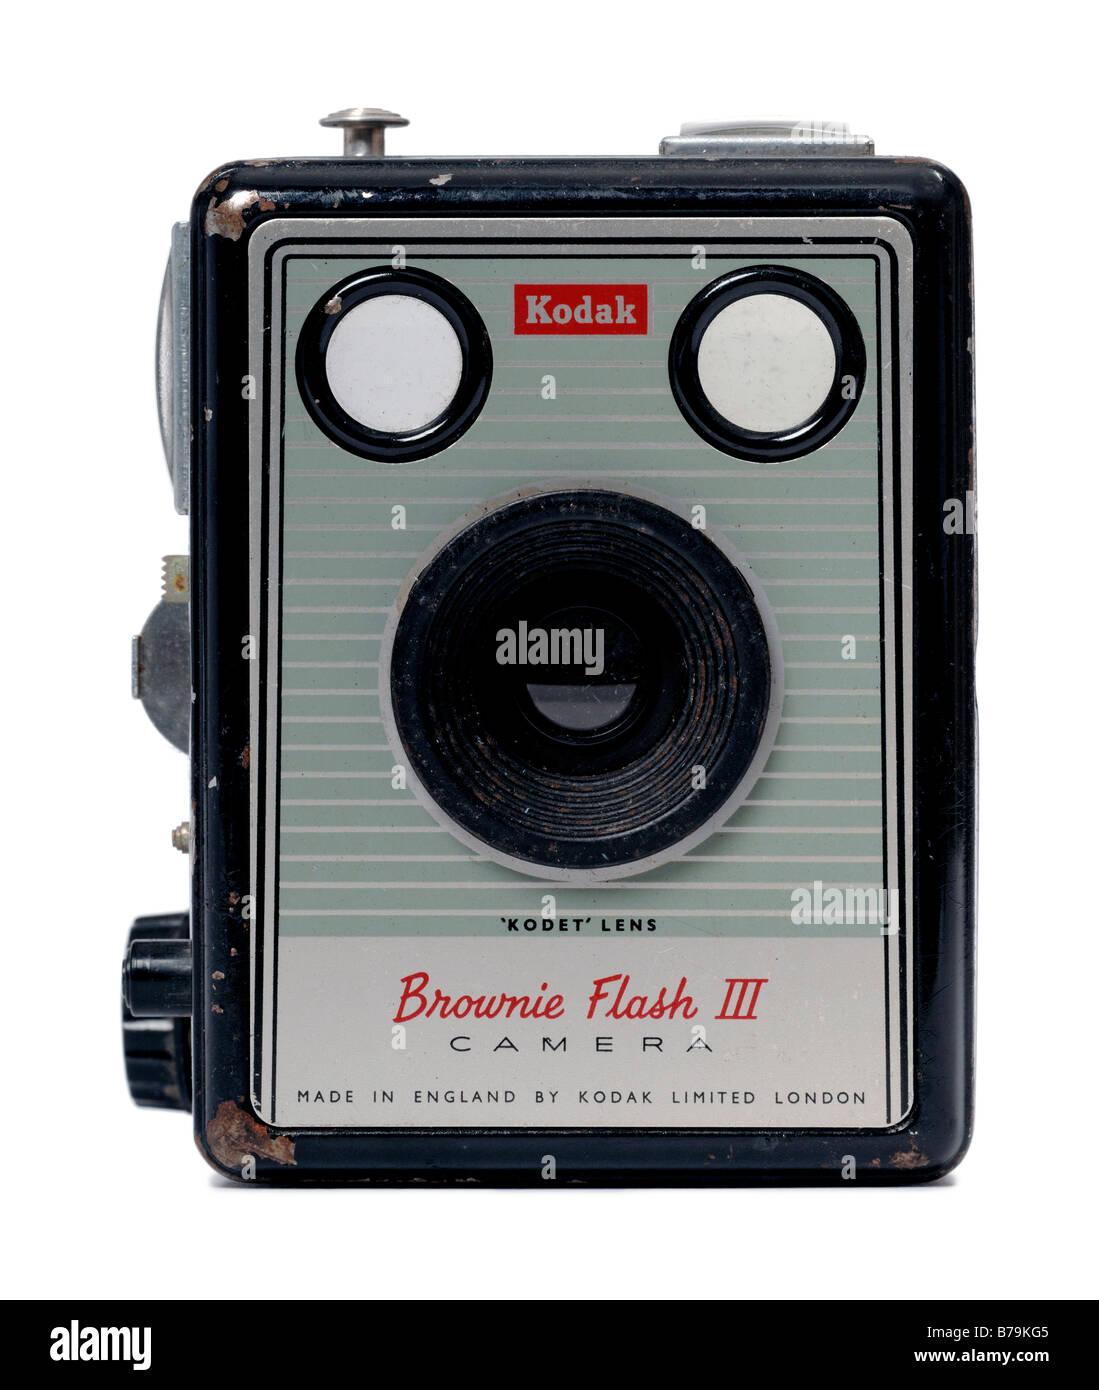 Kodak Brownie Flash camera - Stock Image